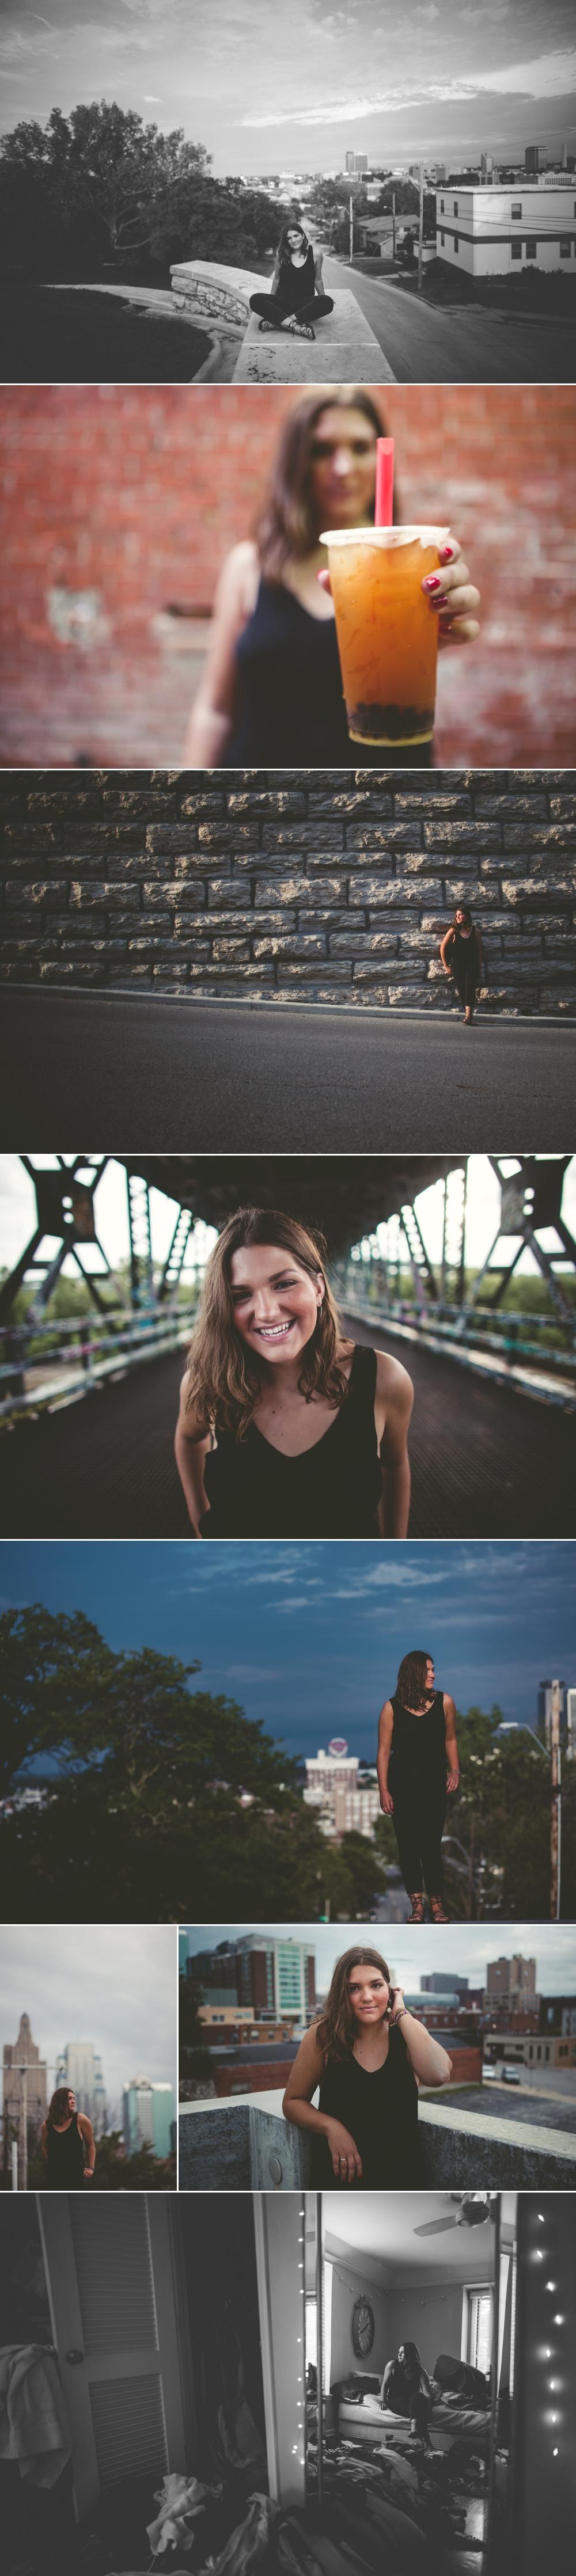 jason_domingues_photography_best_kansas_city_photographer_senior_portraits_02.jpg